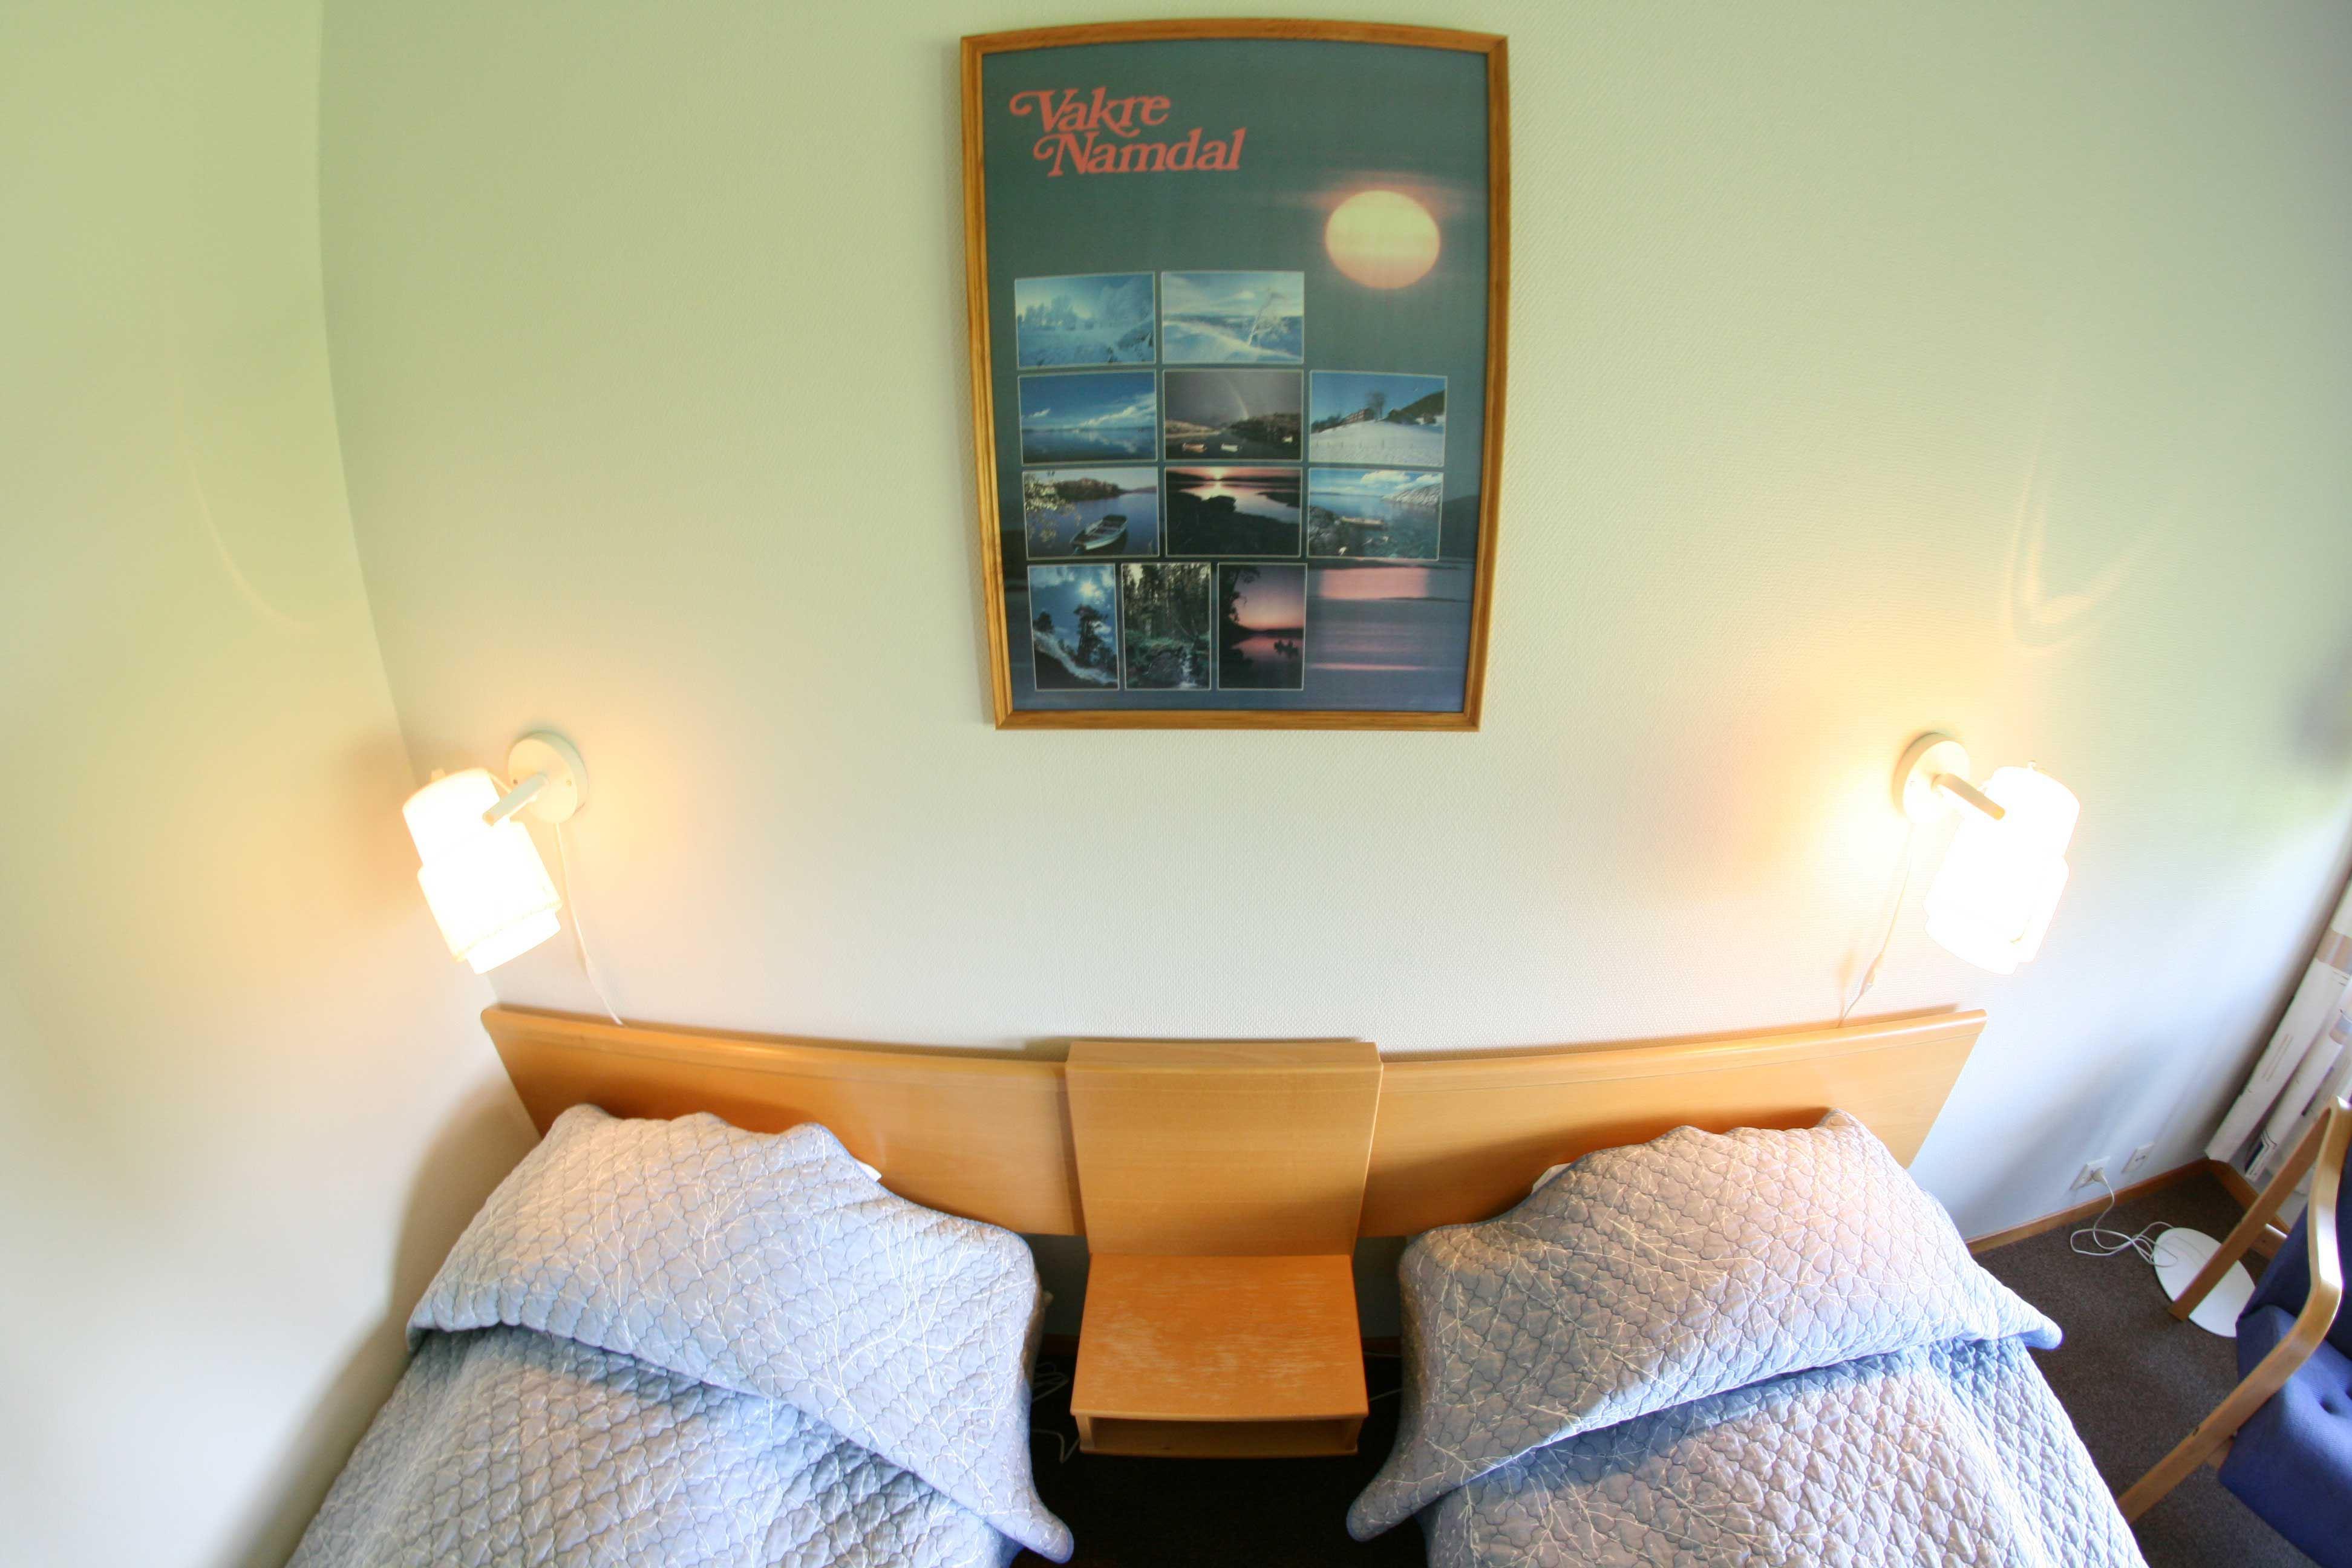 Overhalla Hotel